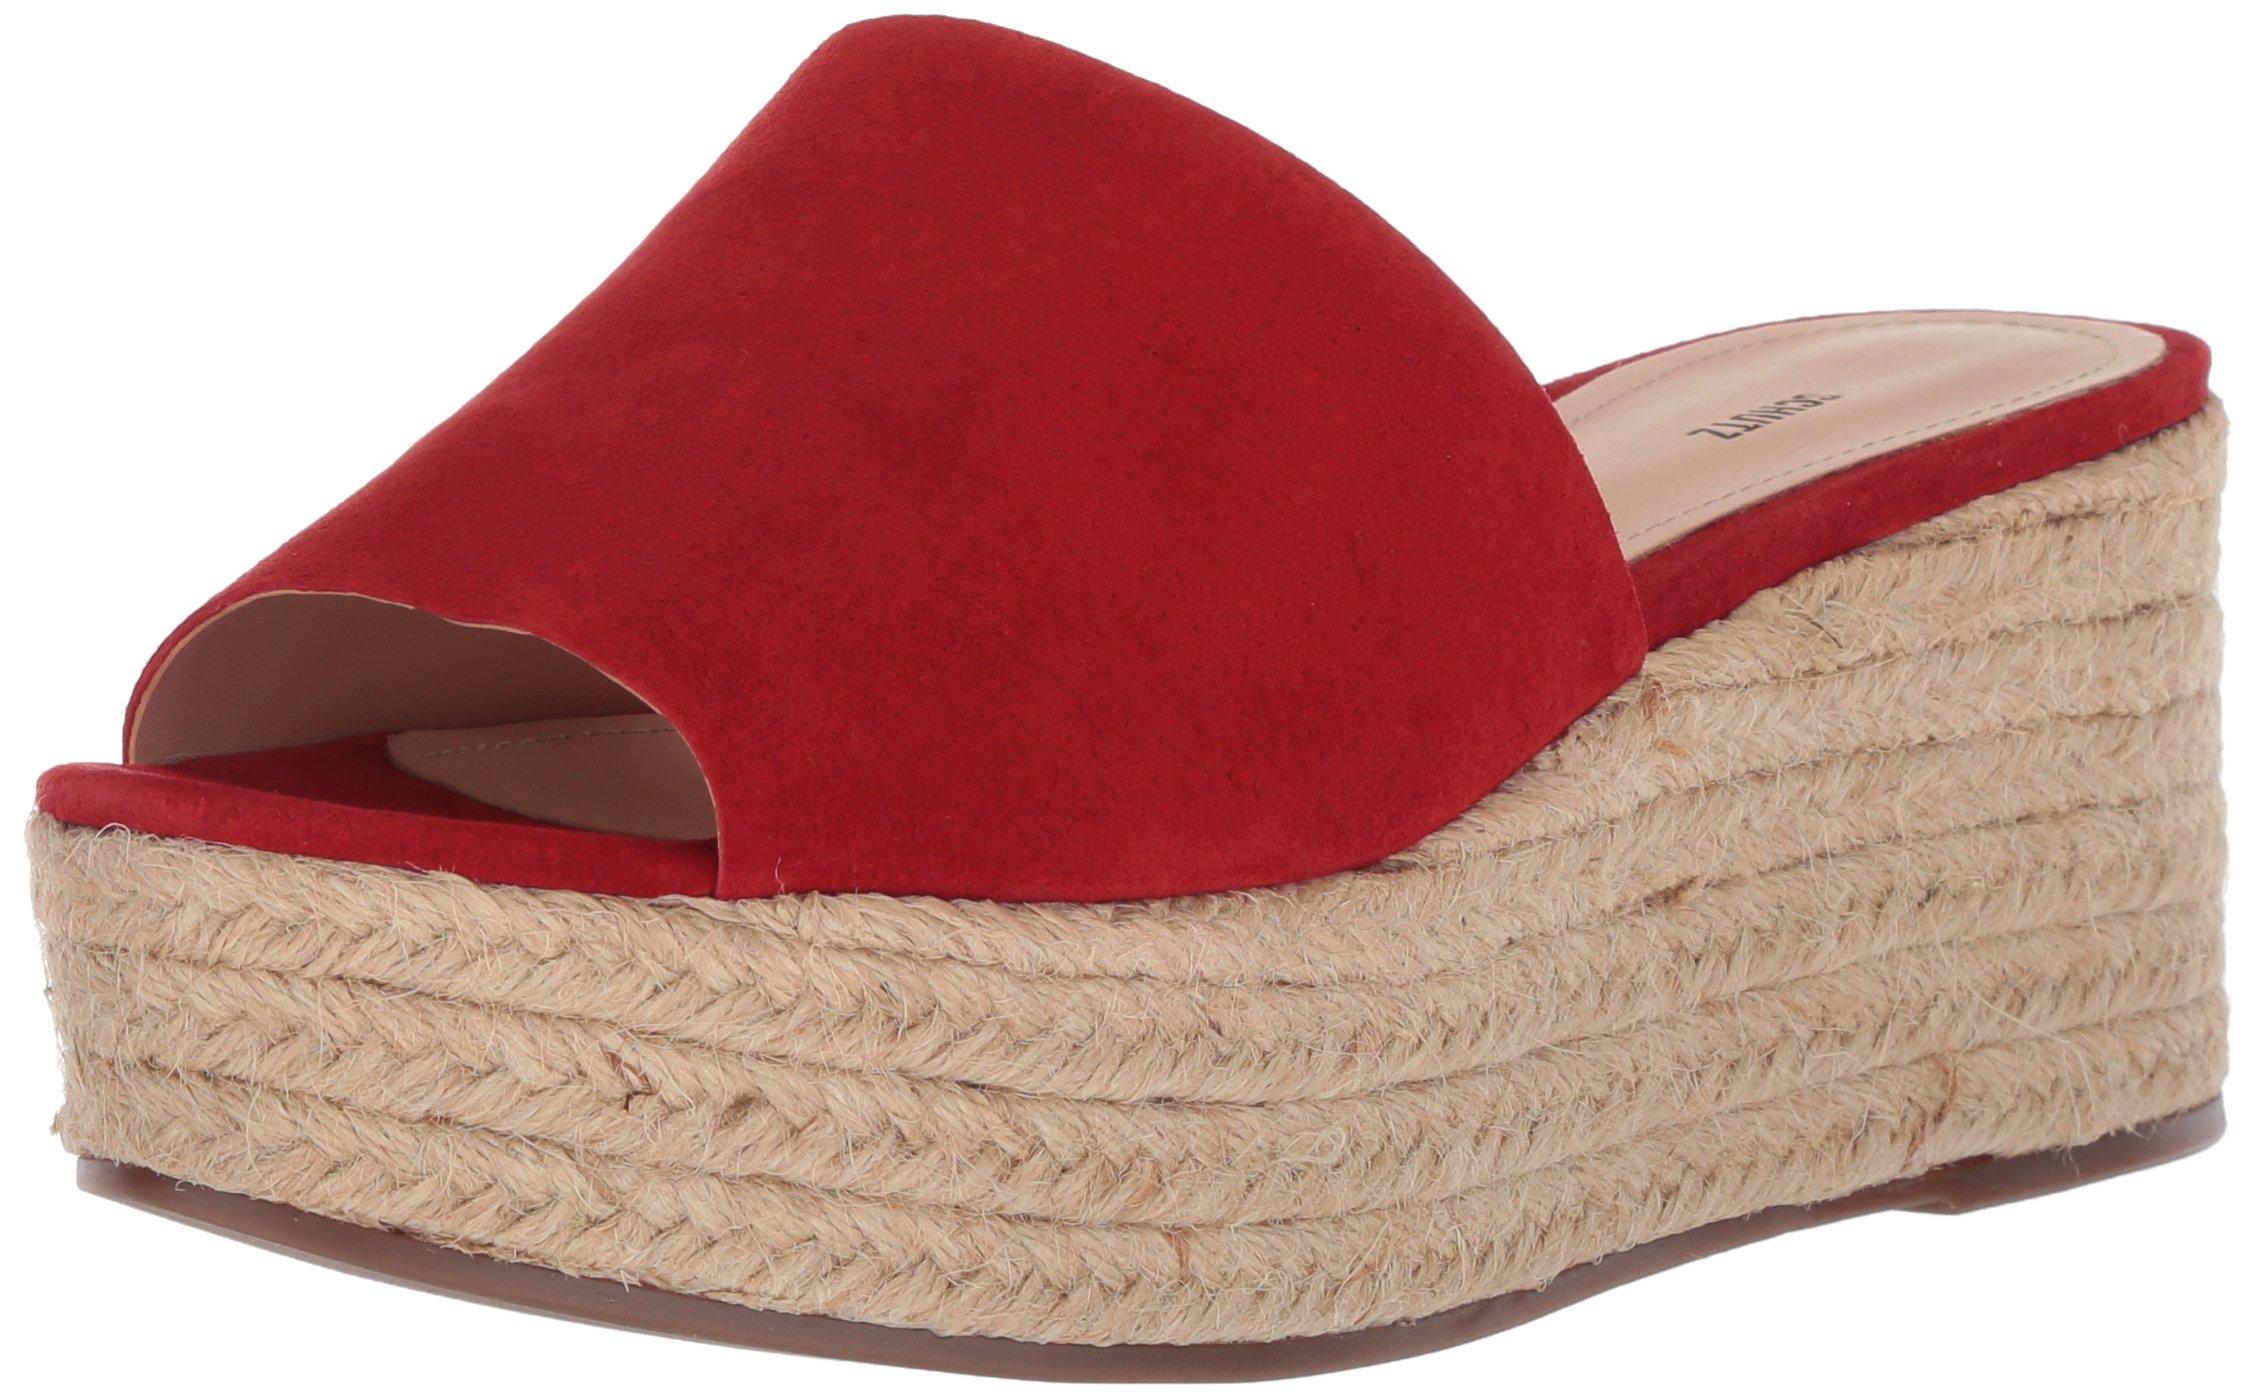 4bfa2d82cdd09 SCHUTZ Women's Thalia Espadrille Wedge Sandal, Tango red, 6 M US